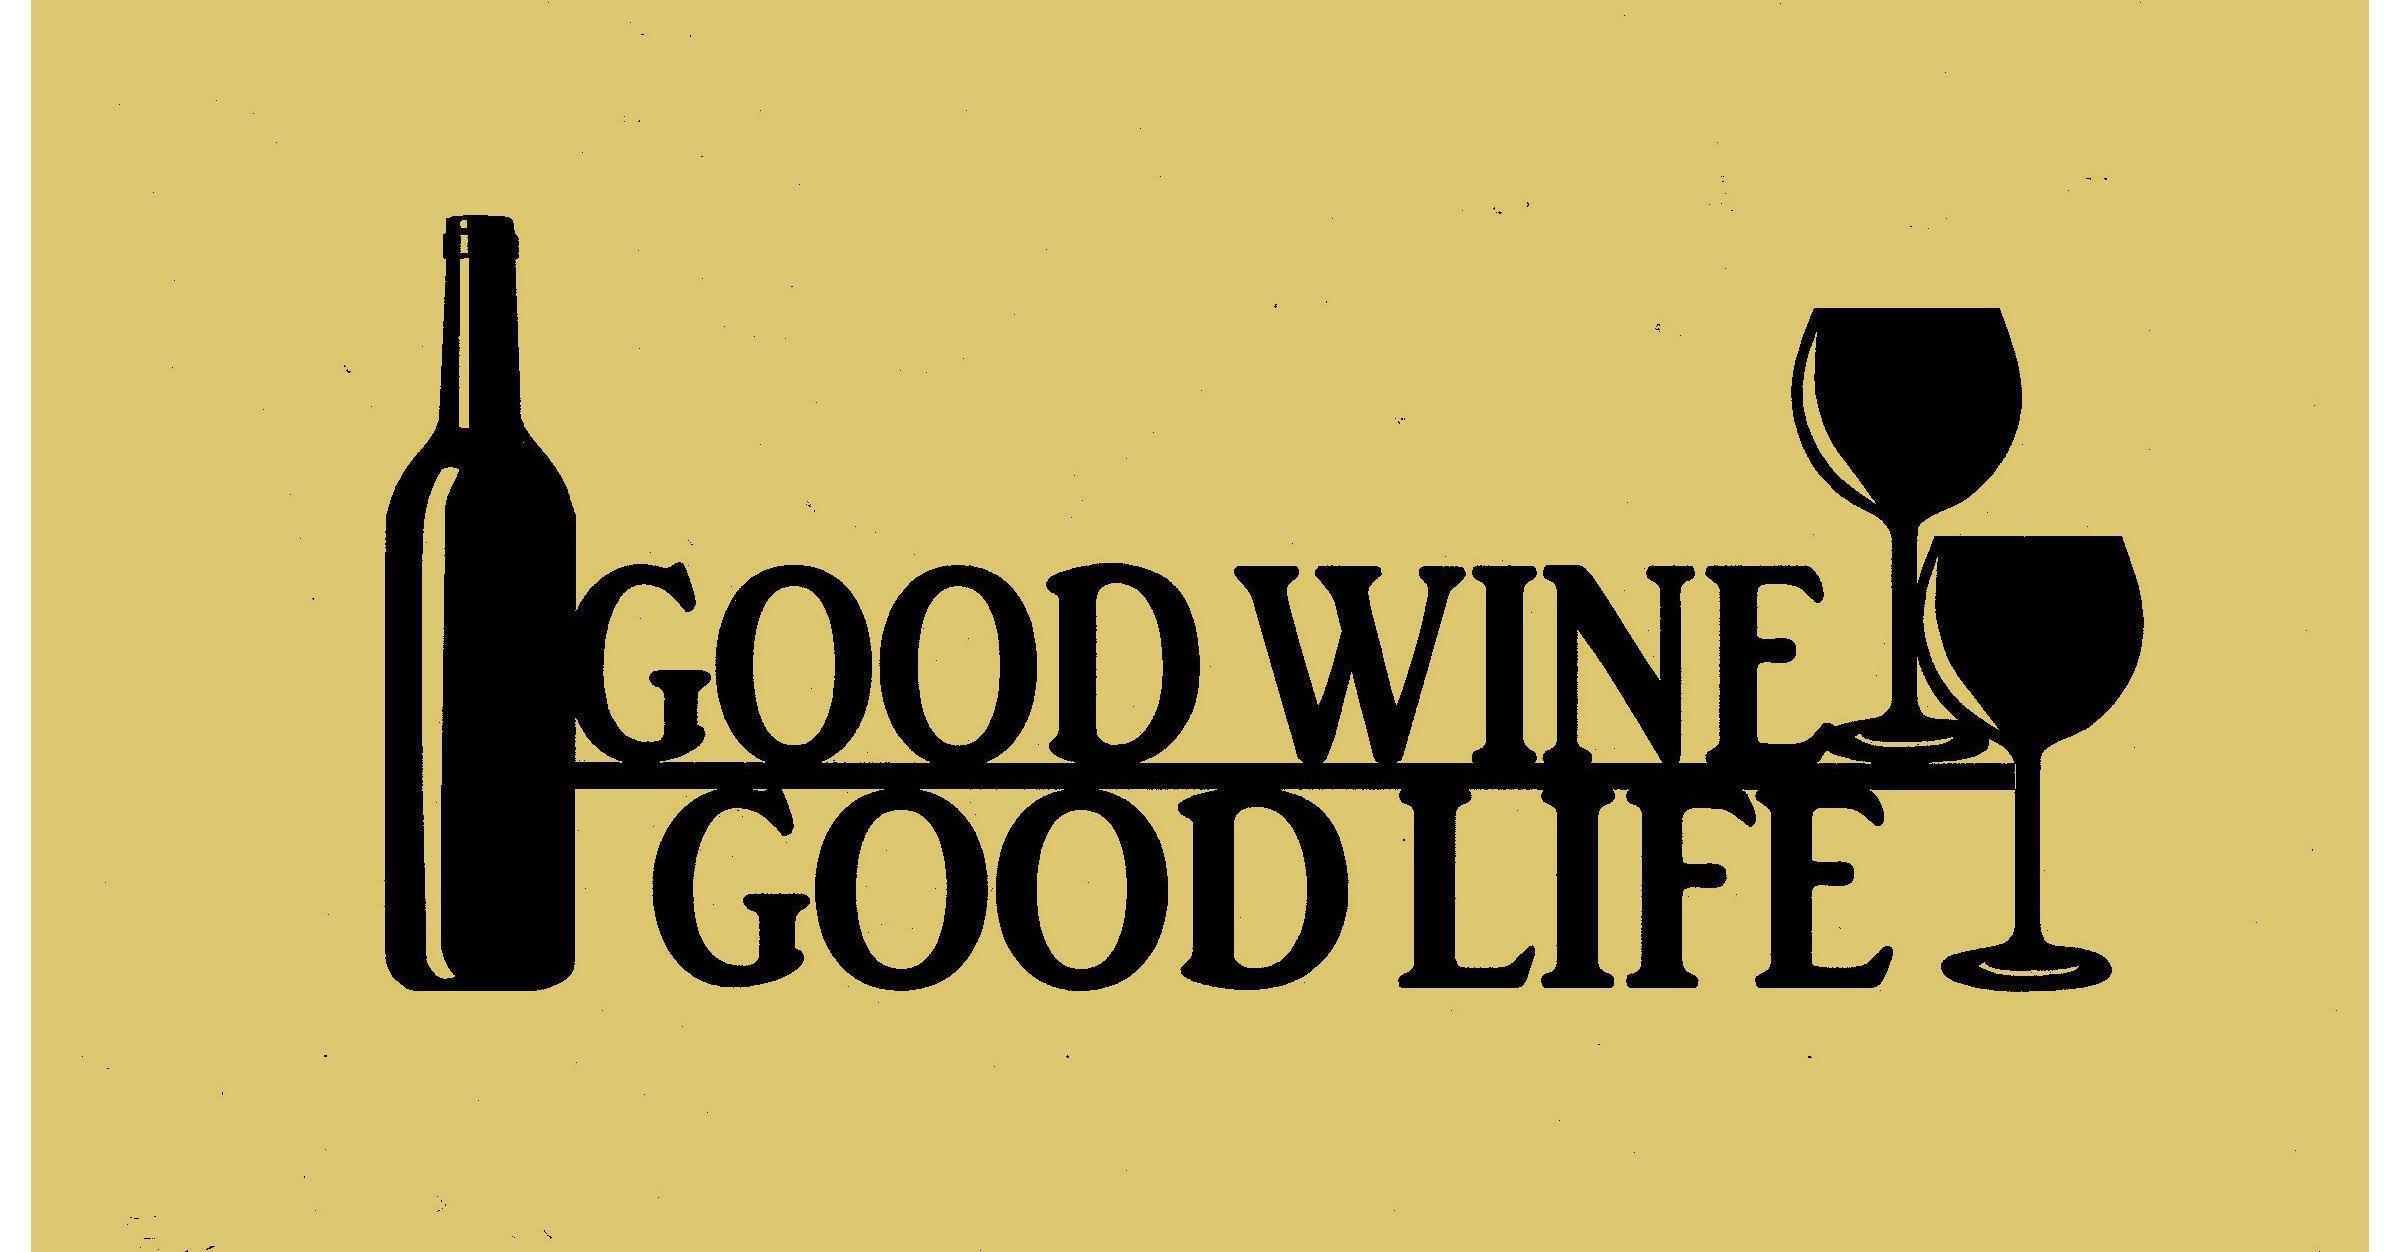 Good Wine Good Life Wall Decor WineSignMetal | Etsy